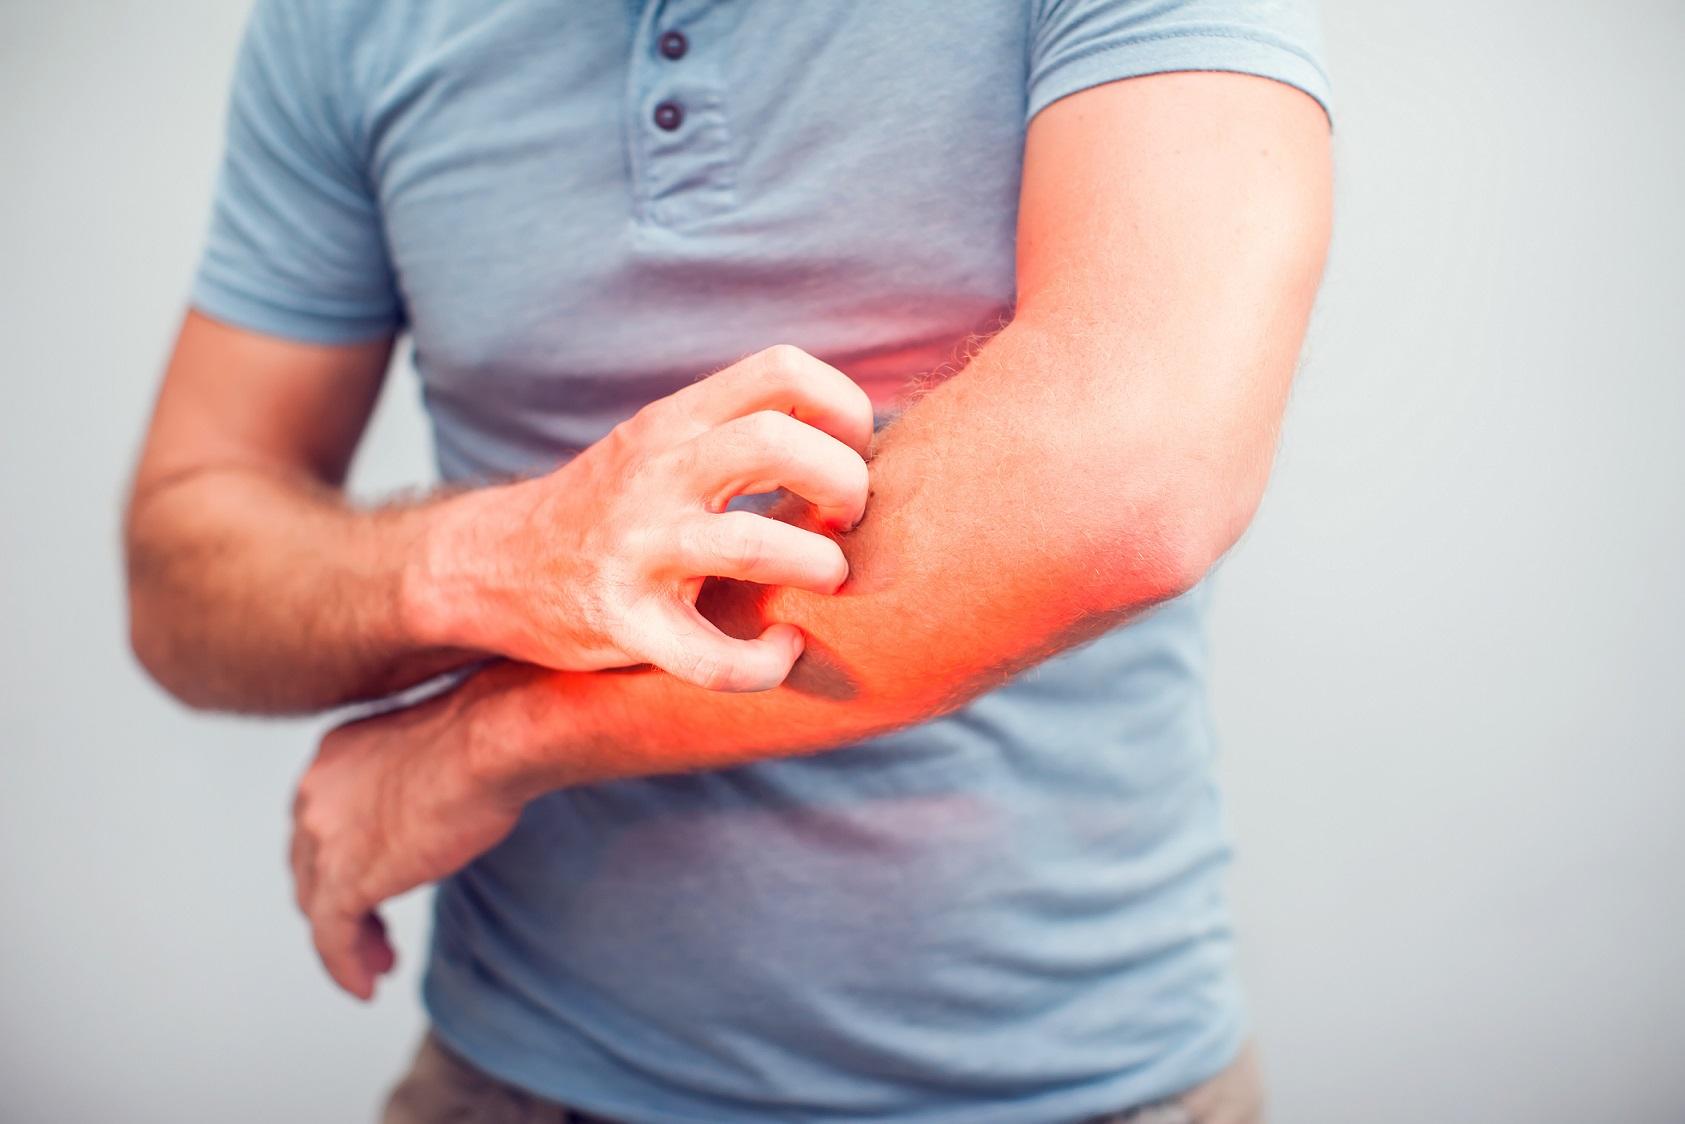 Eczema clinical trial at MAC